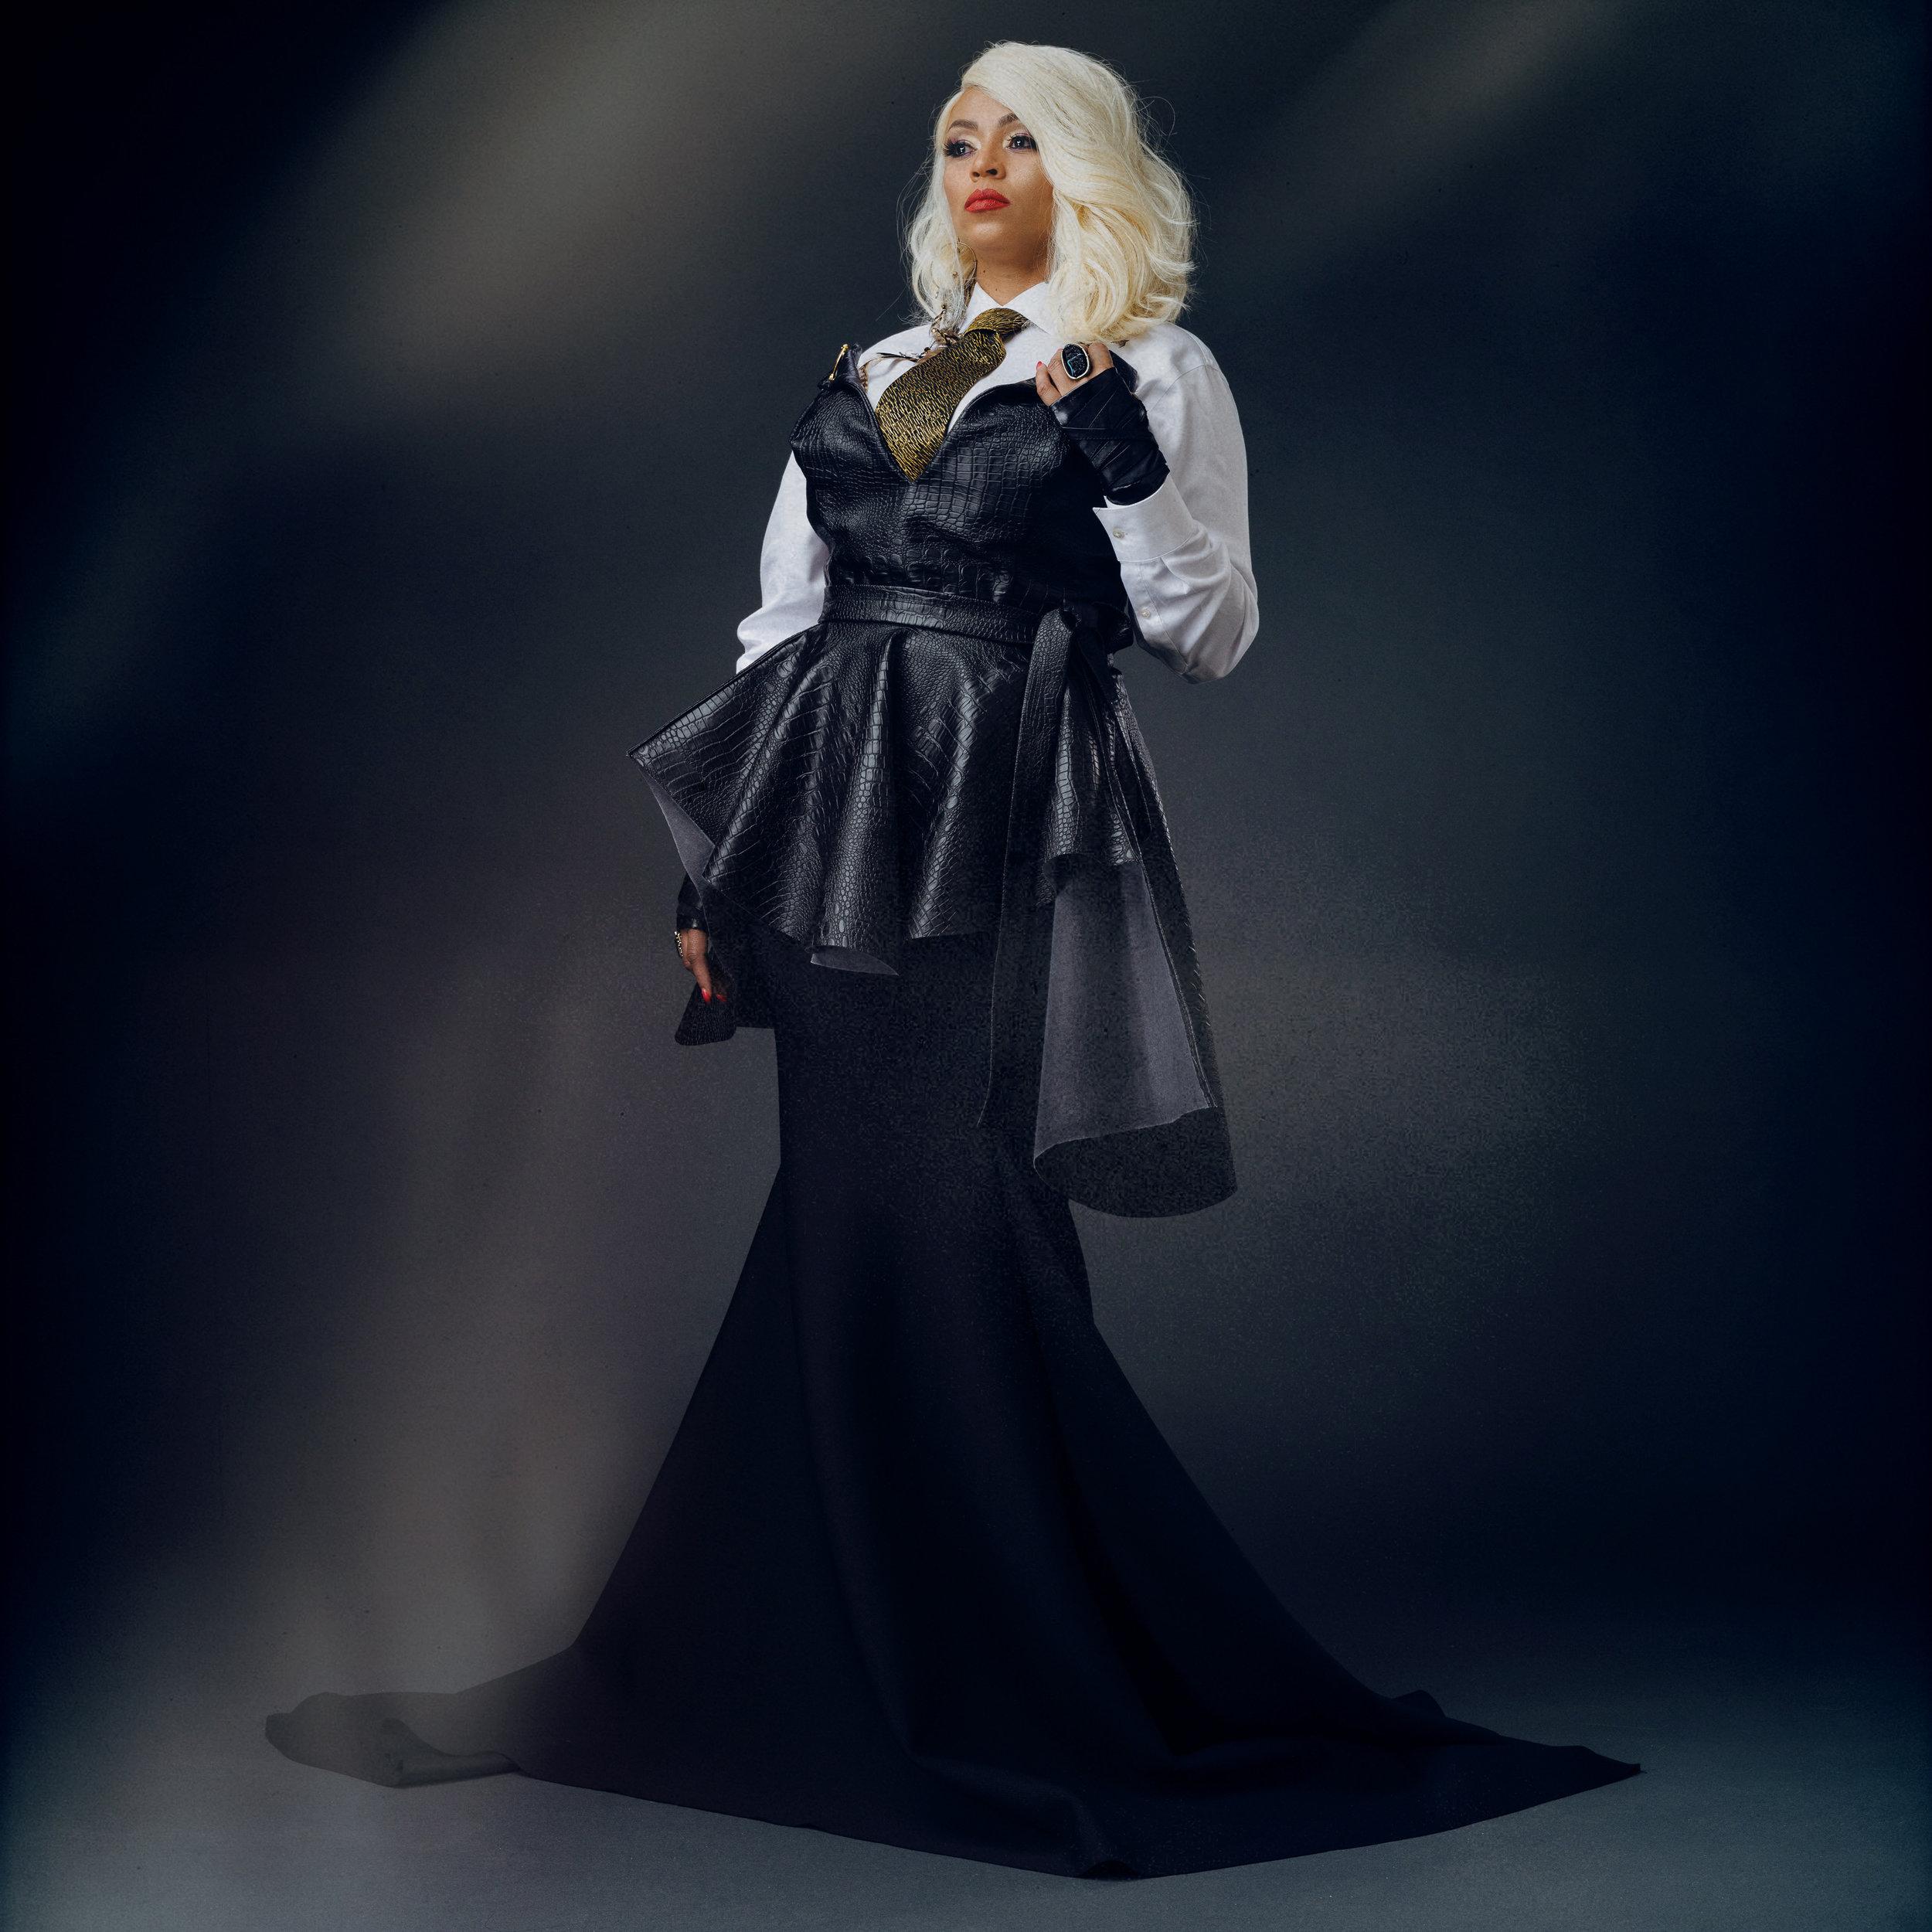 darlene mccoy, 2019 musician